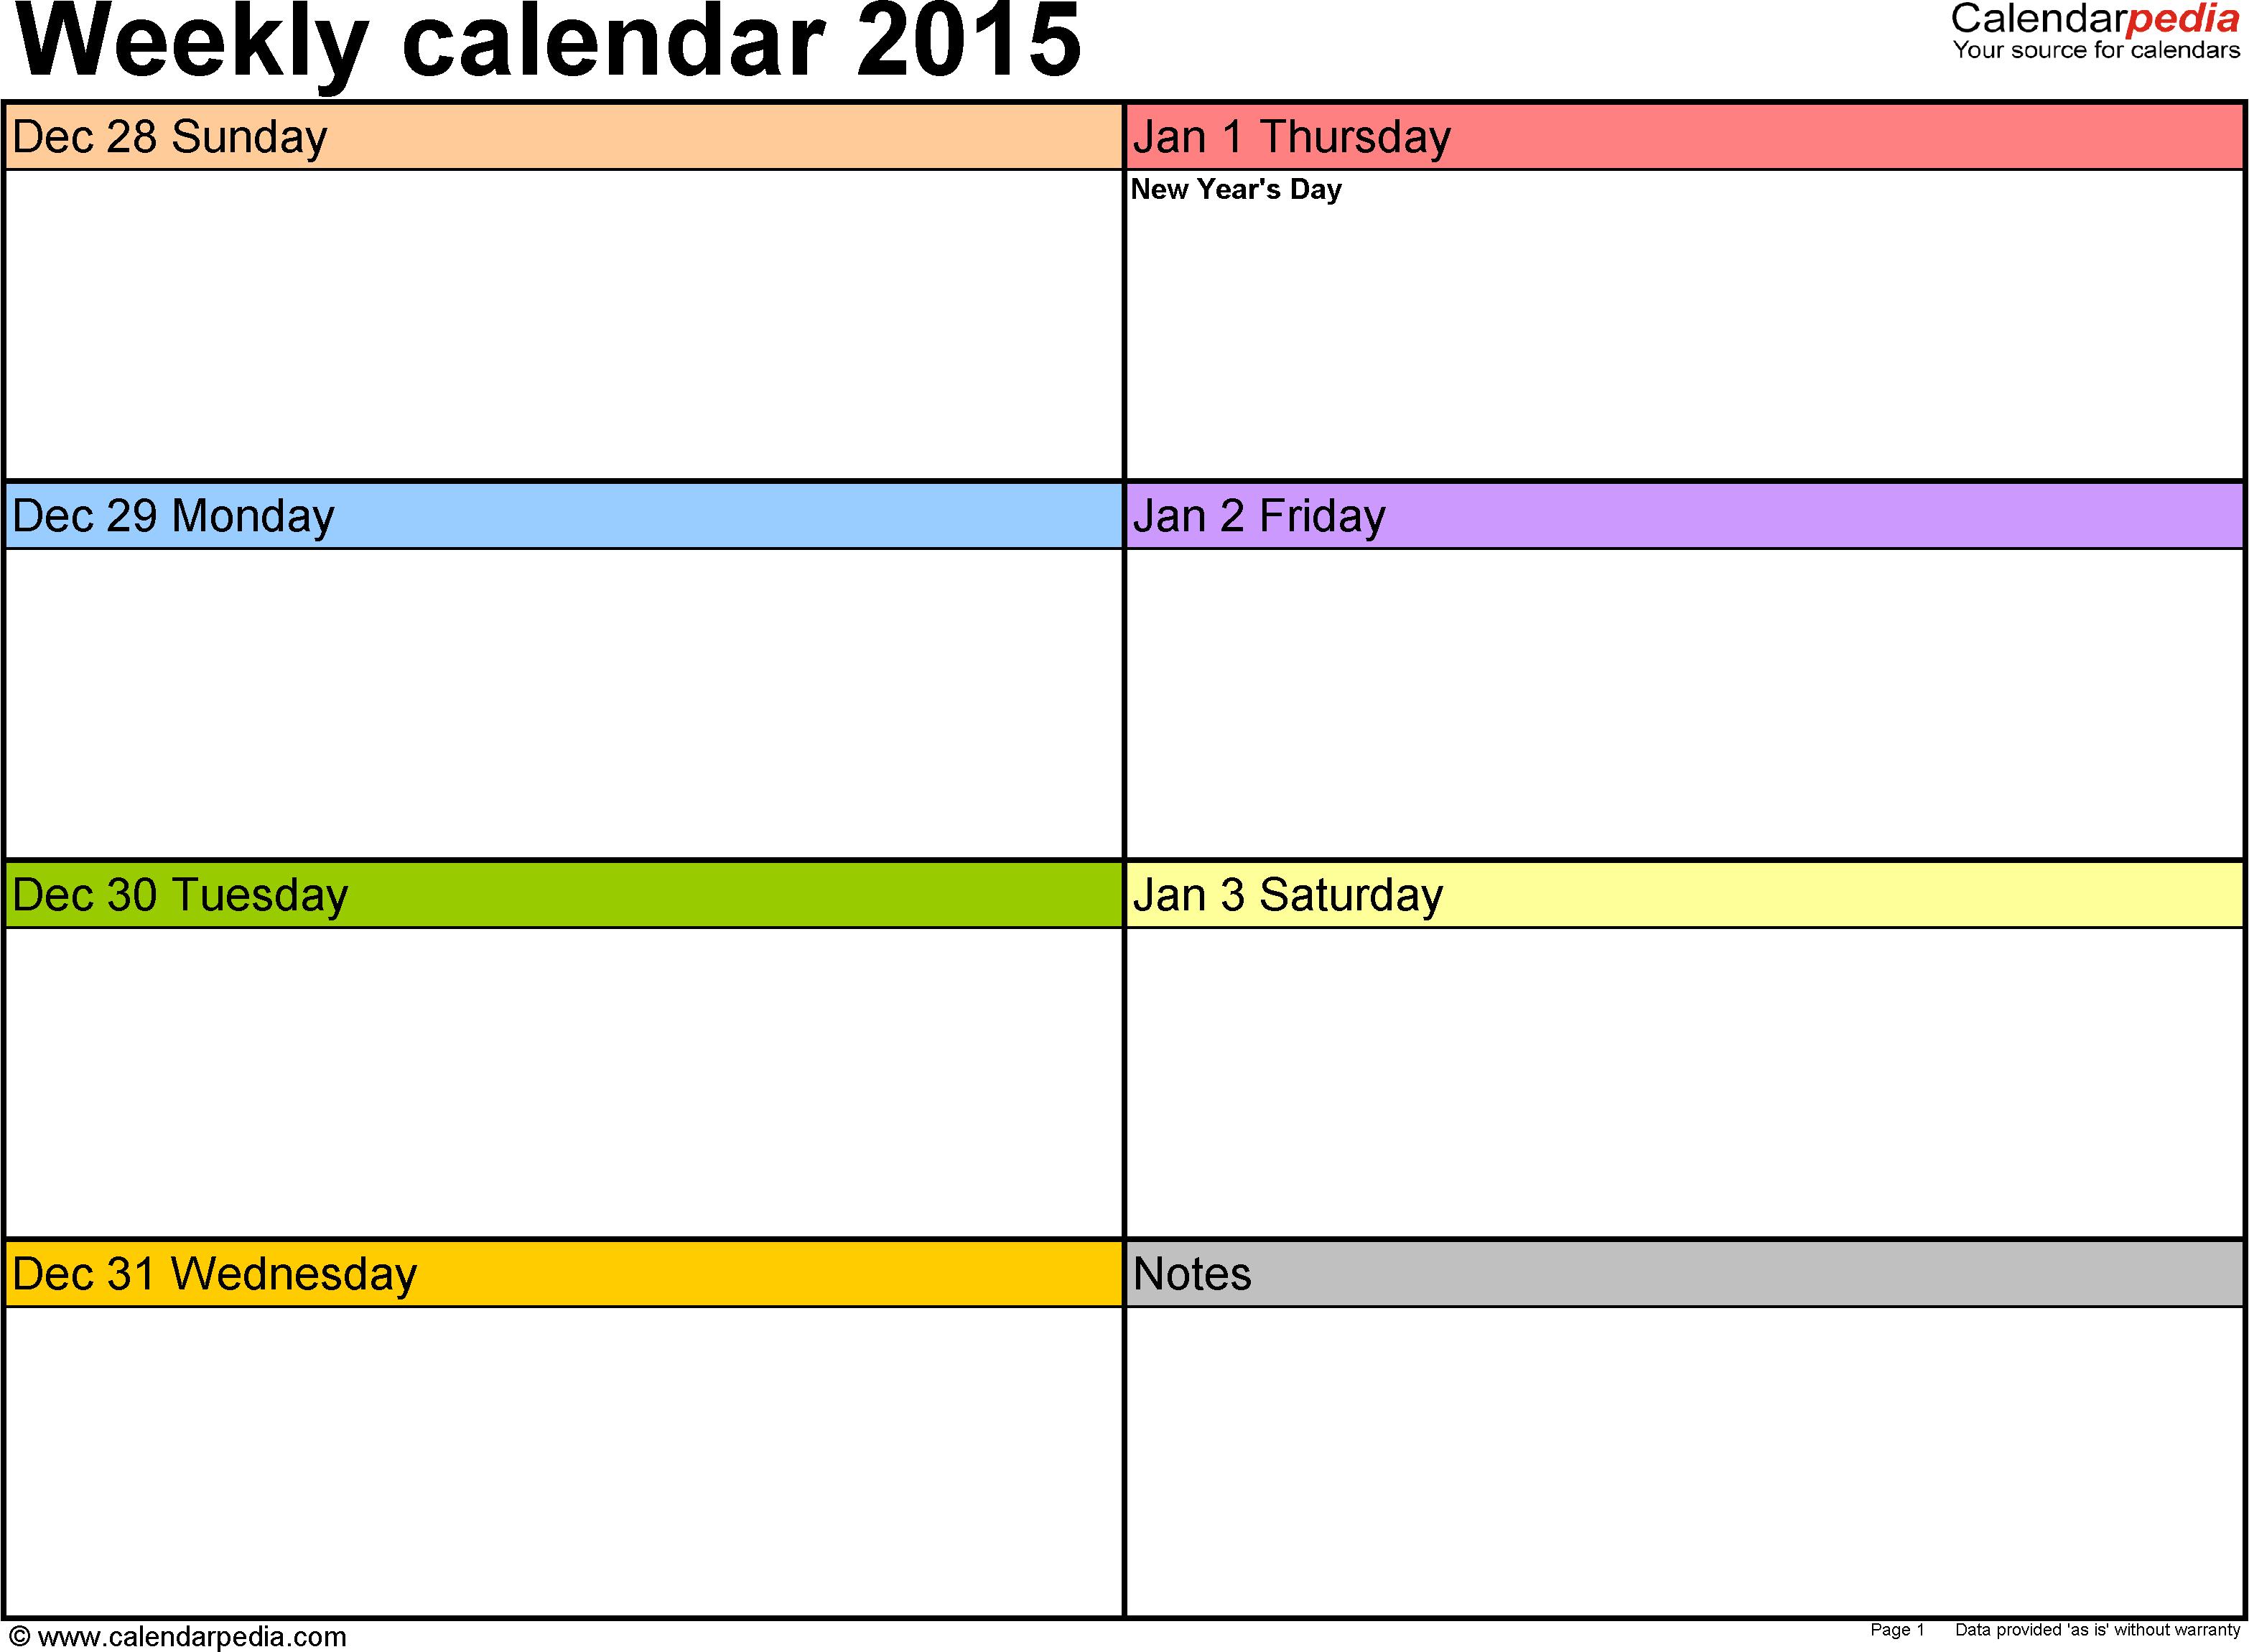 Weekly Calendar 2015 For Pdf - 12 Free Printable Templates pertaining to 2 Week Blank Calendar Template